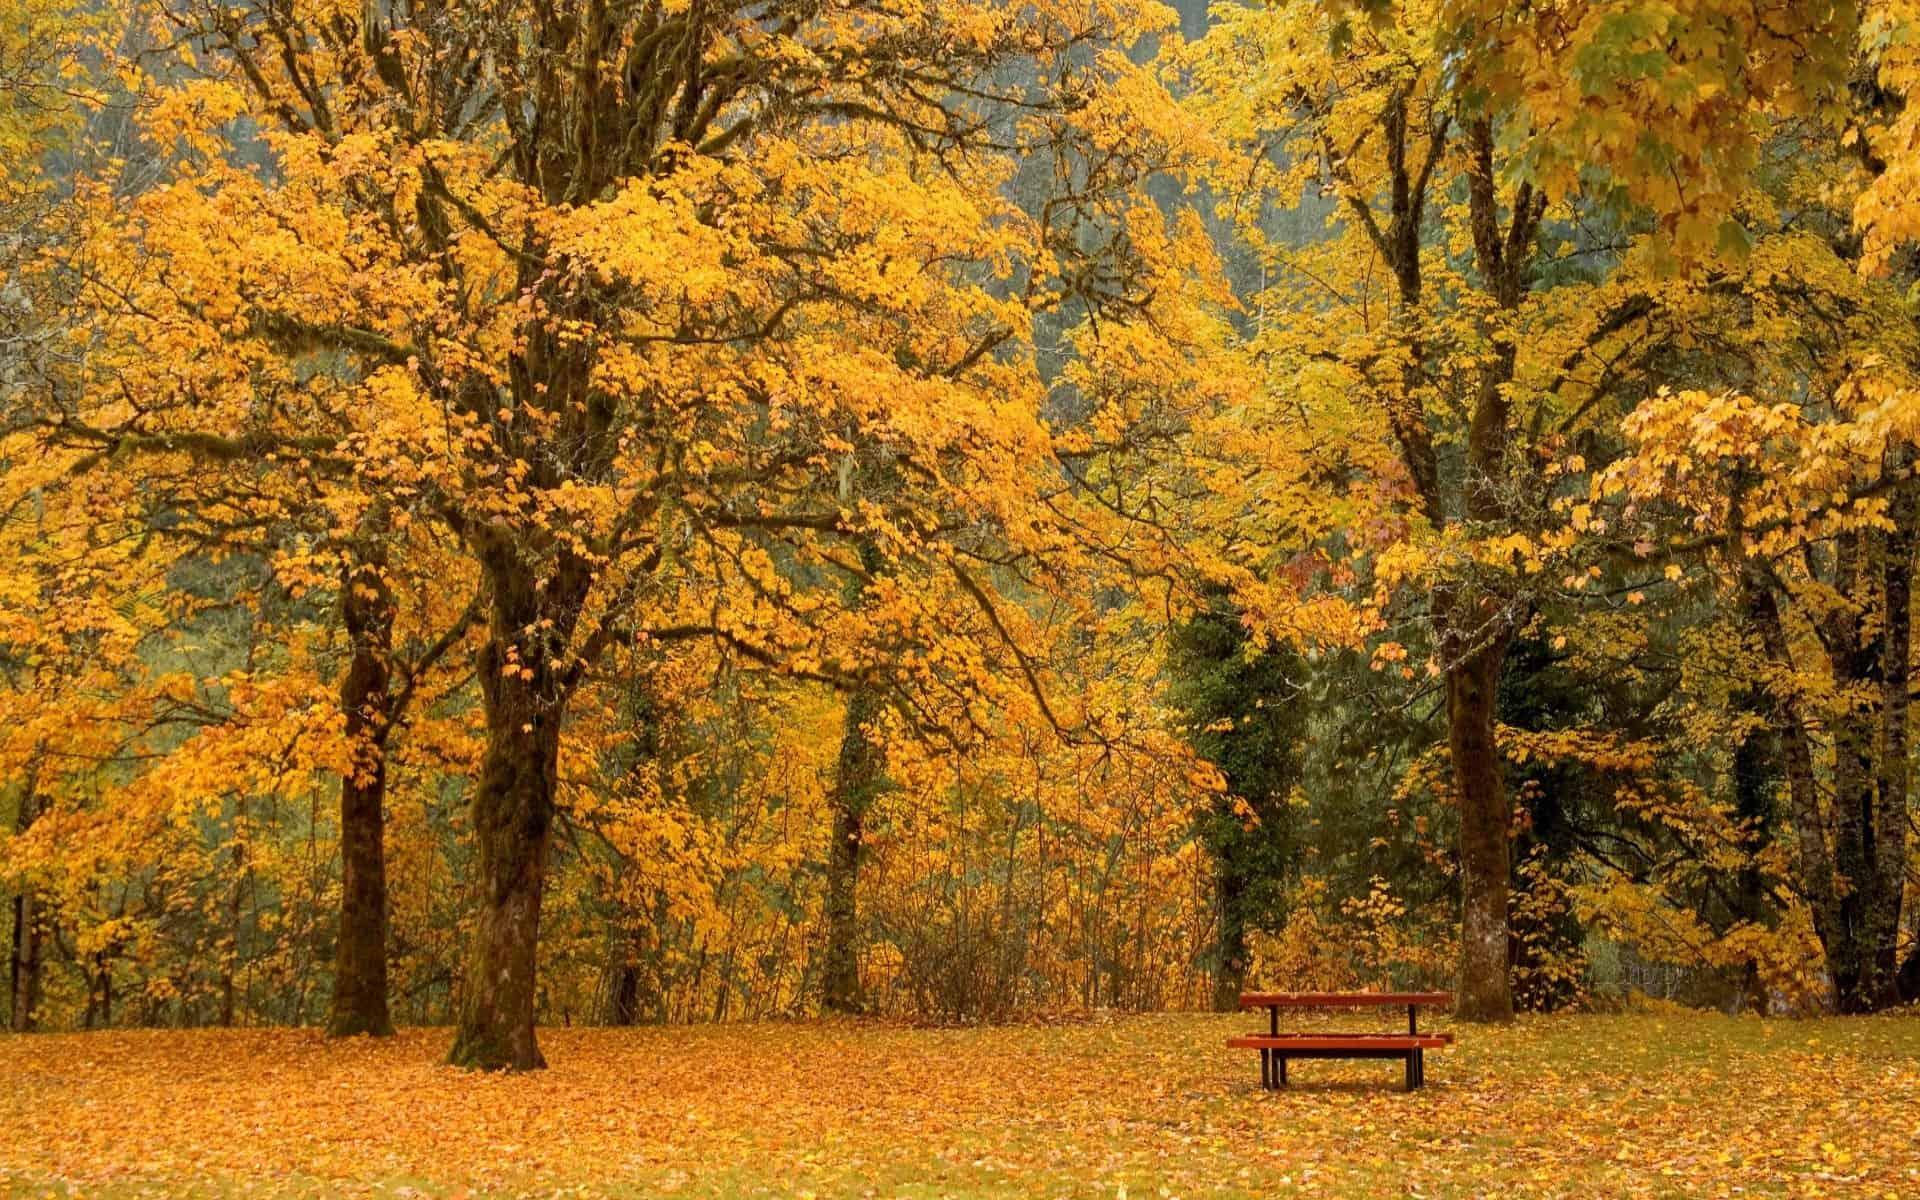 Autumn Wallpaper 008